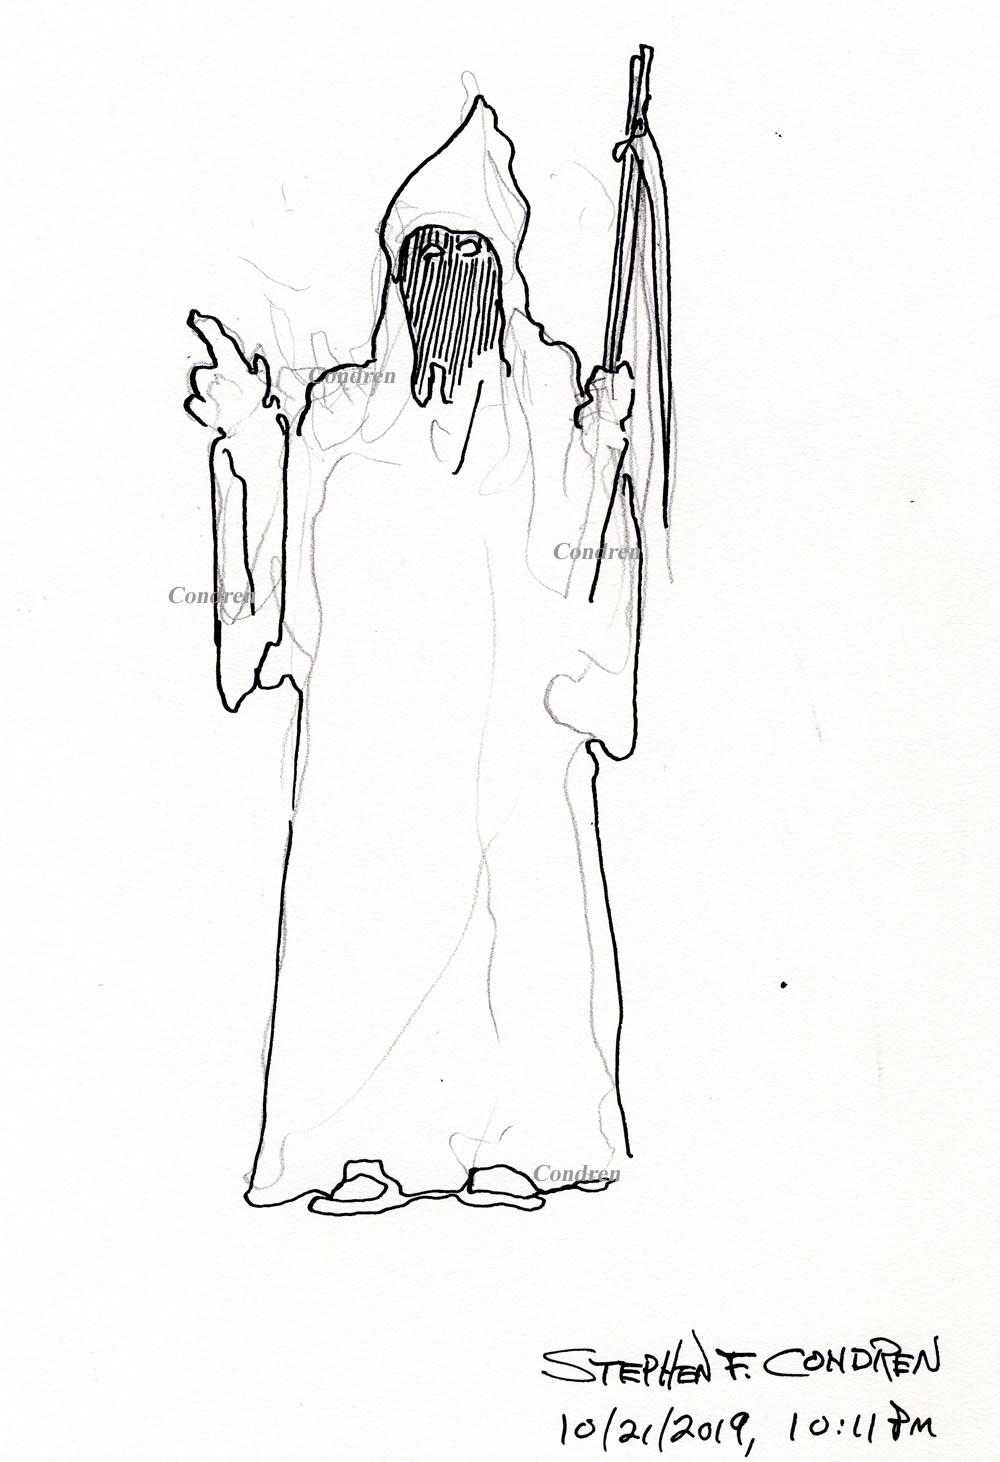 Pen & ink drawing of the Grim Reaper by artist Stephen F. Condren.